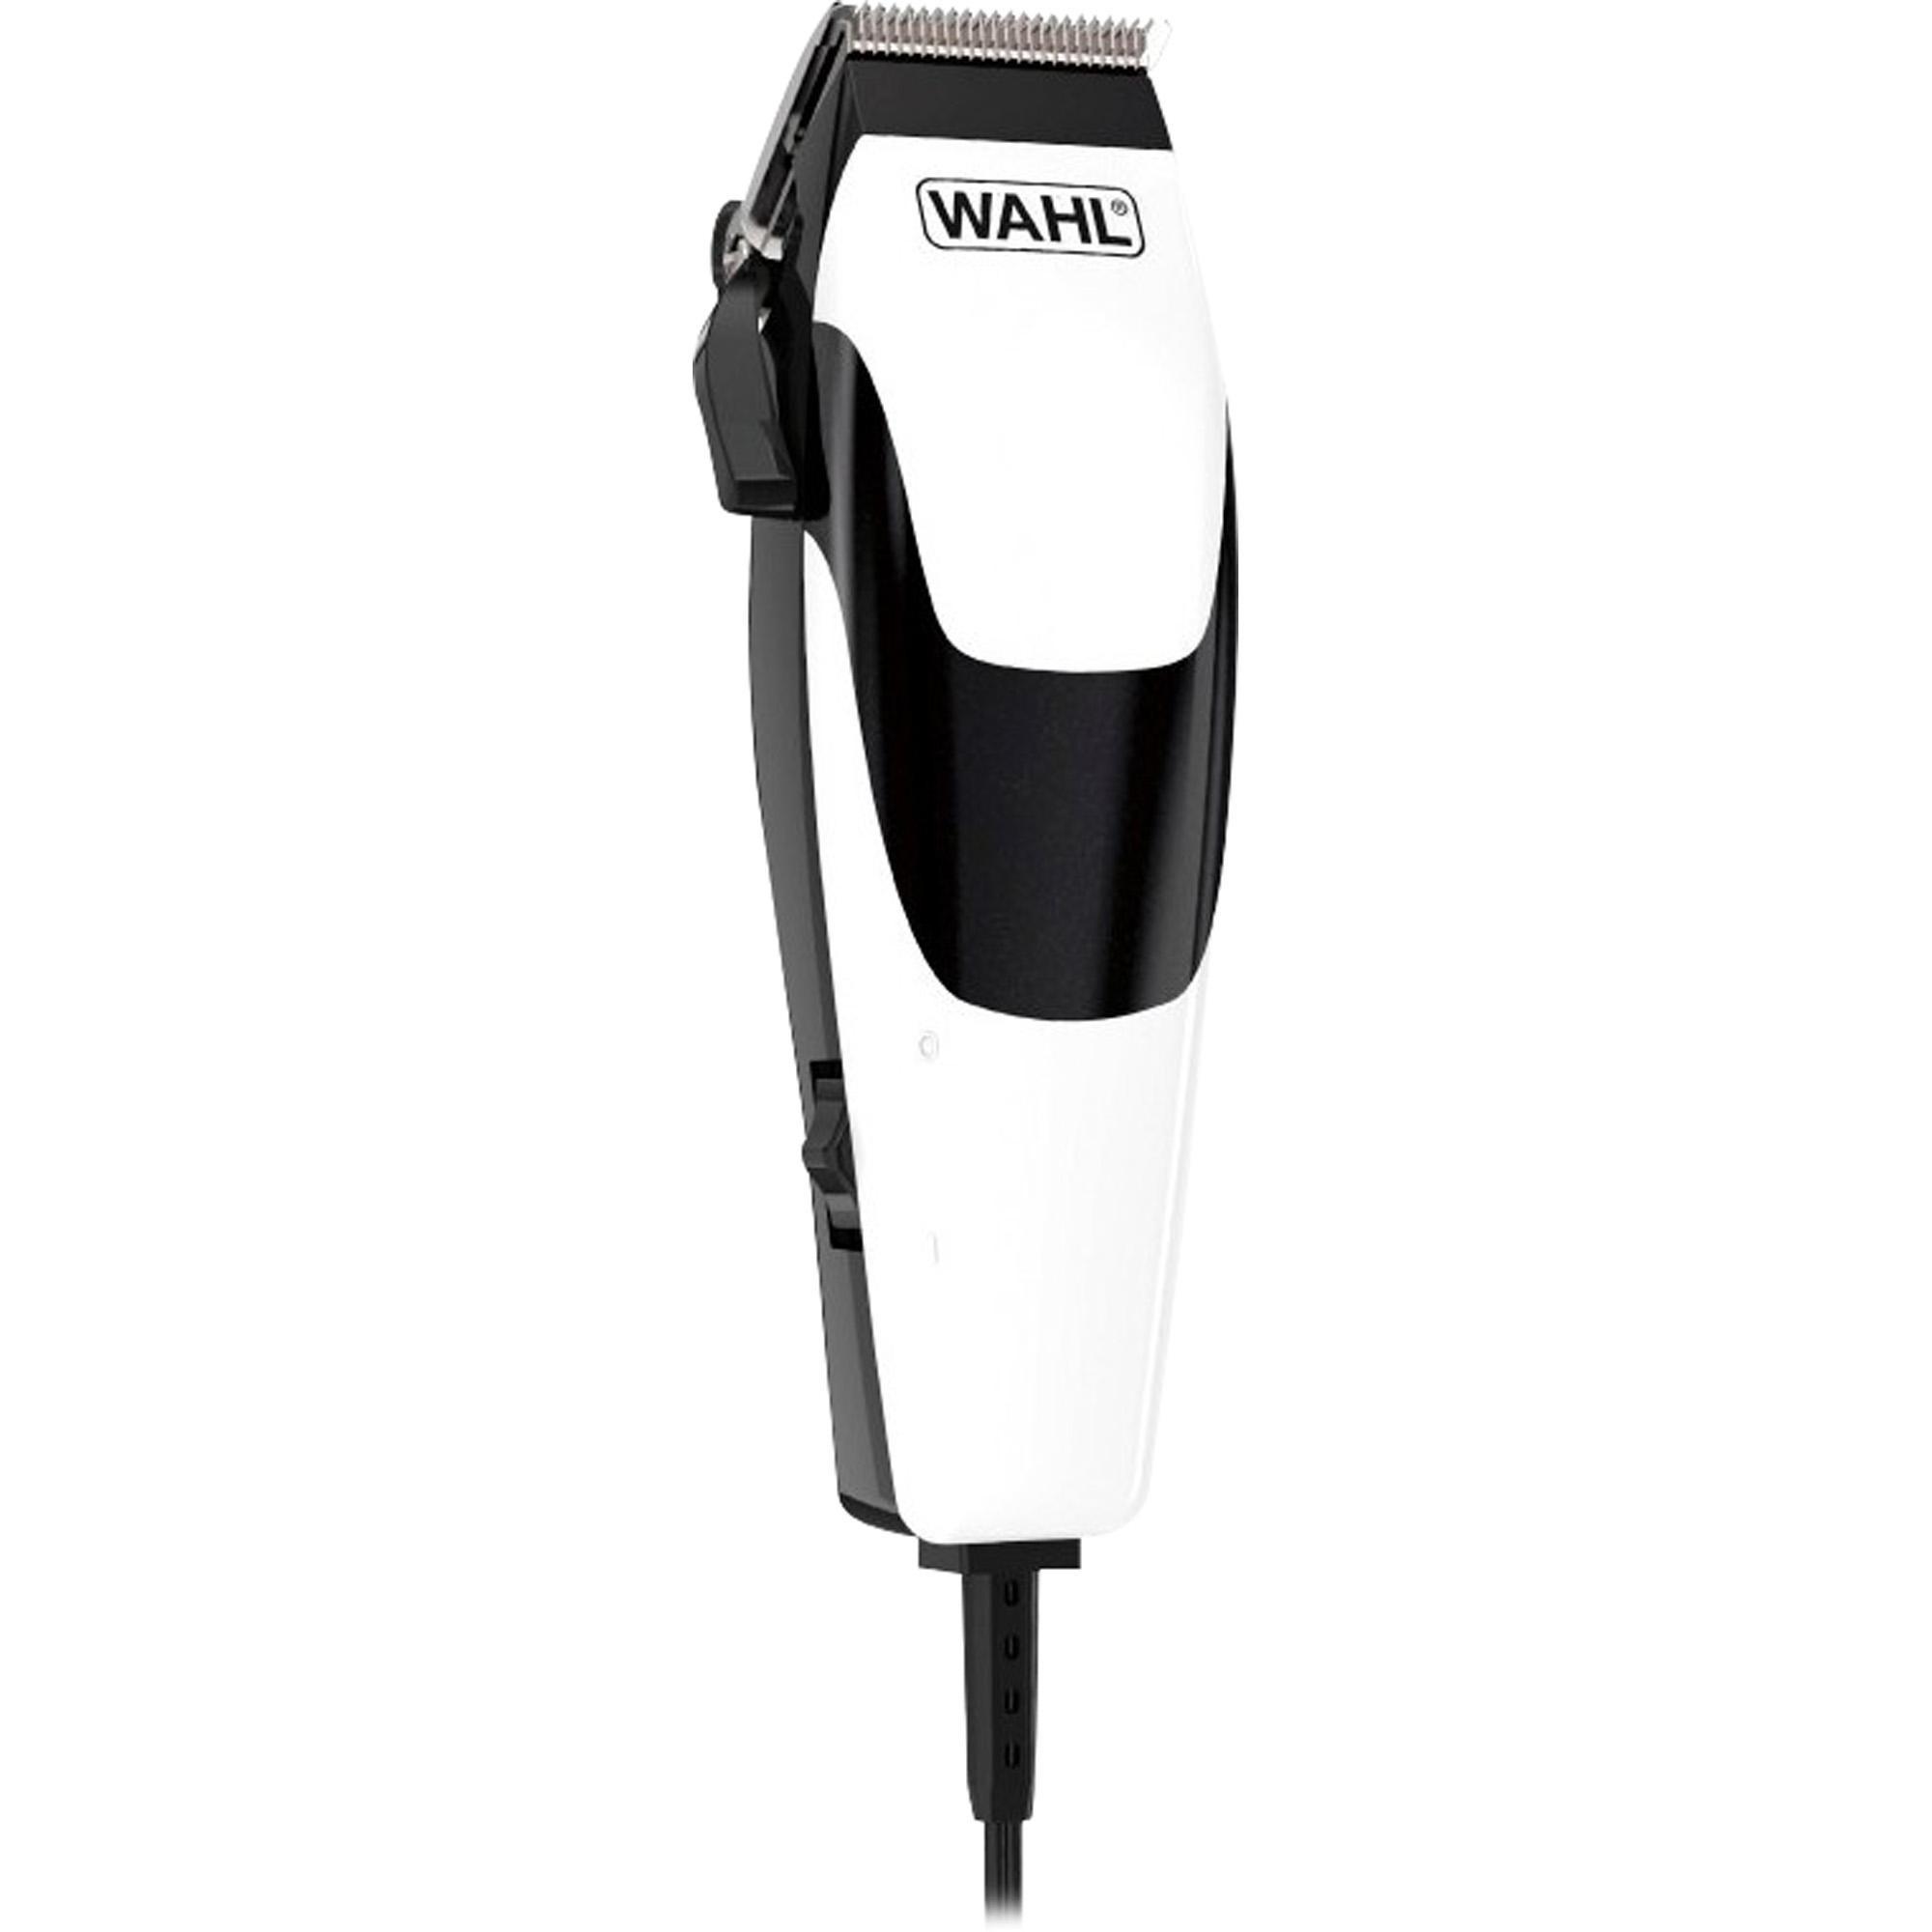 Máquina de Corte 127V Quickcut Branca WAHL